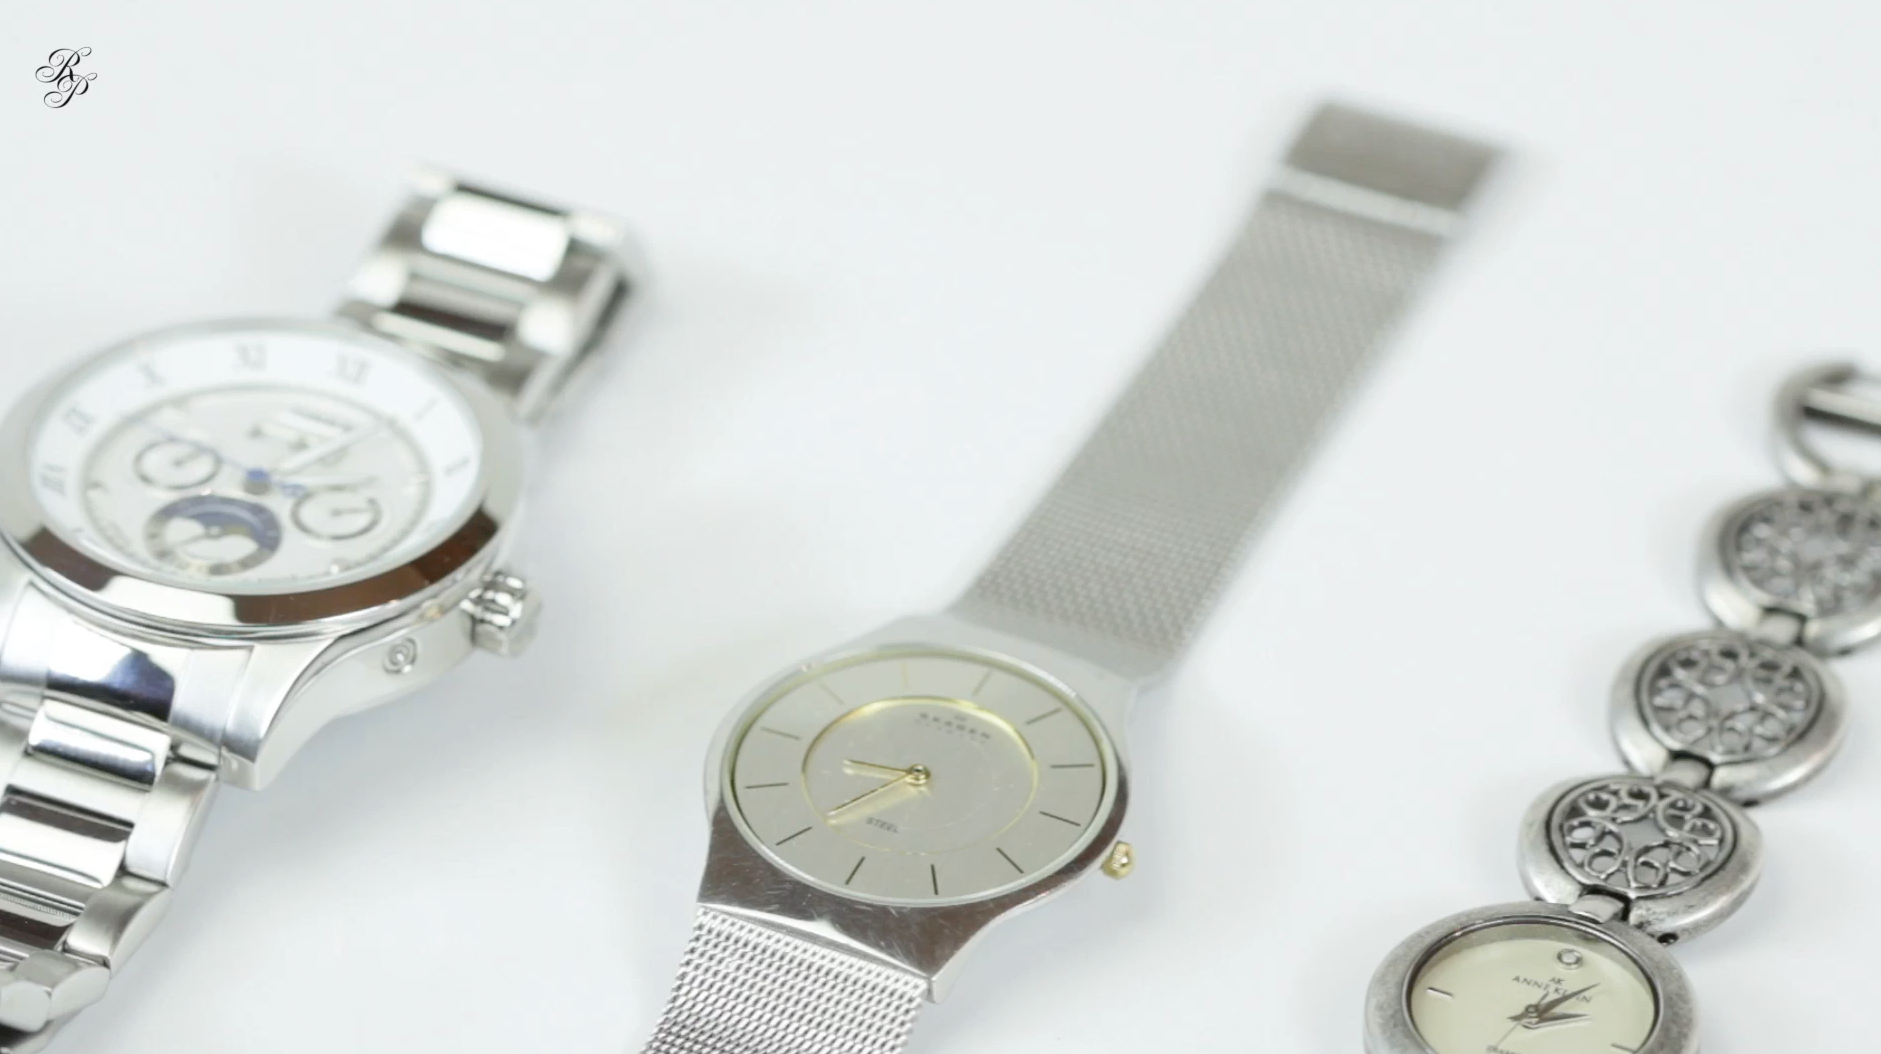 how to shorten a metal watch band